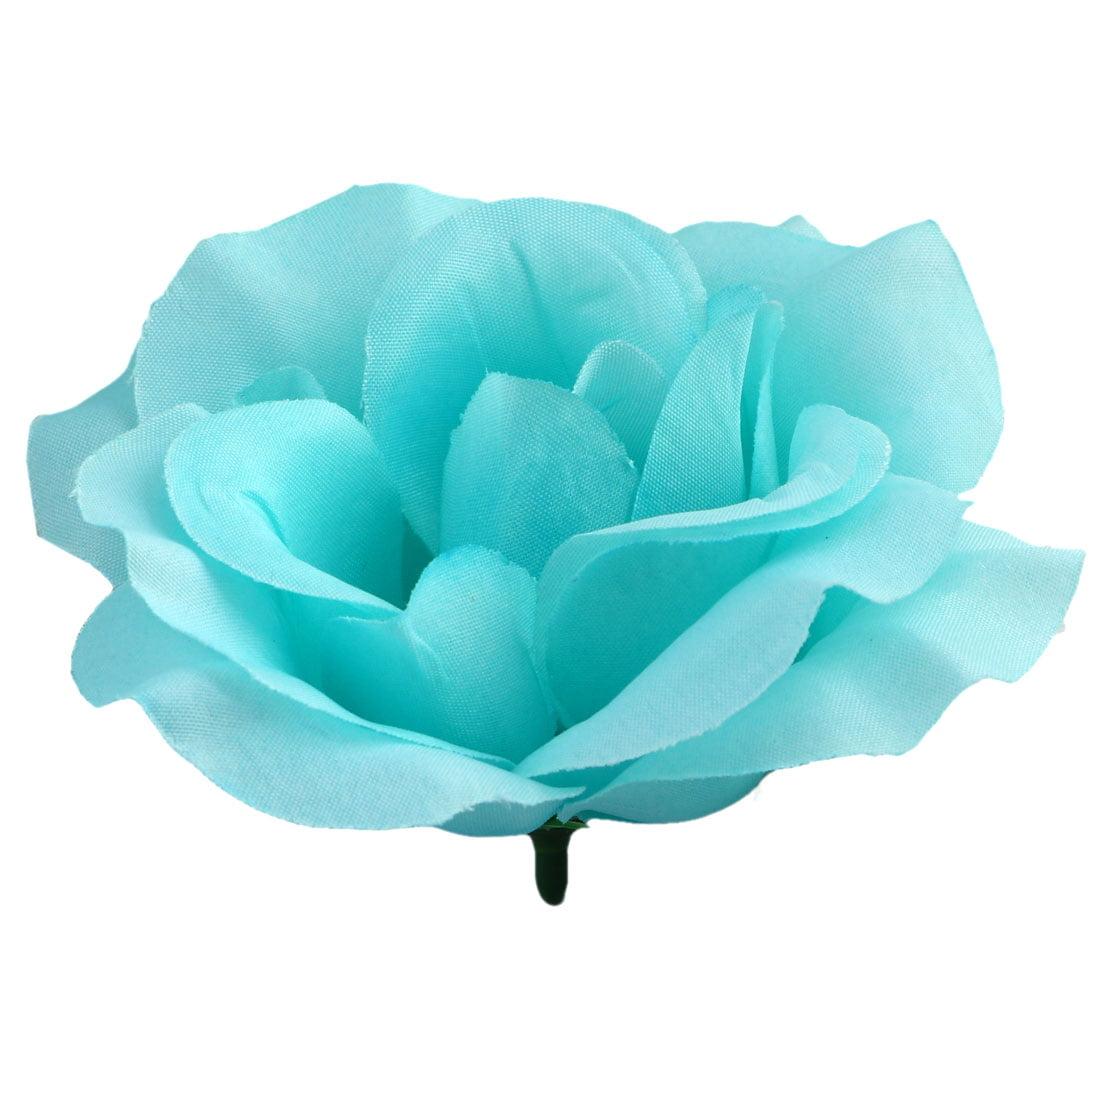 Household Table Handcraft Artificial Fabric Flower Rose Petal Head Decor # 4